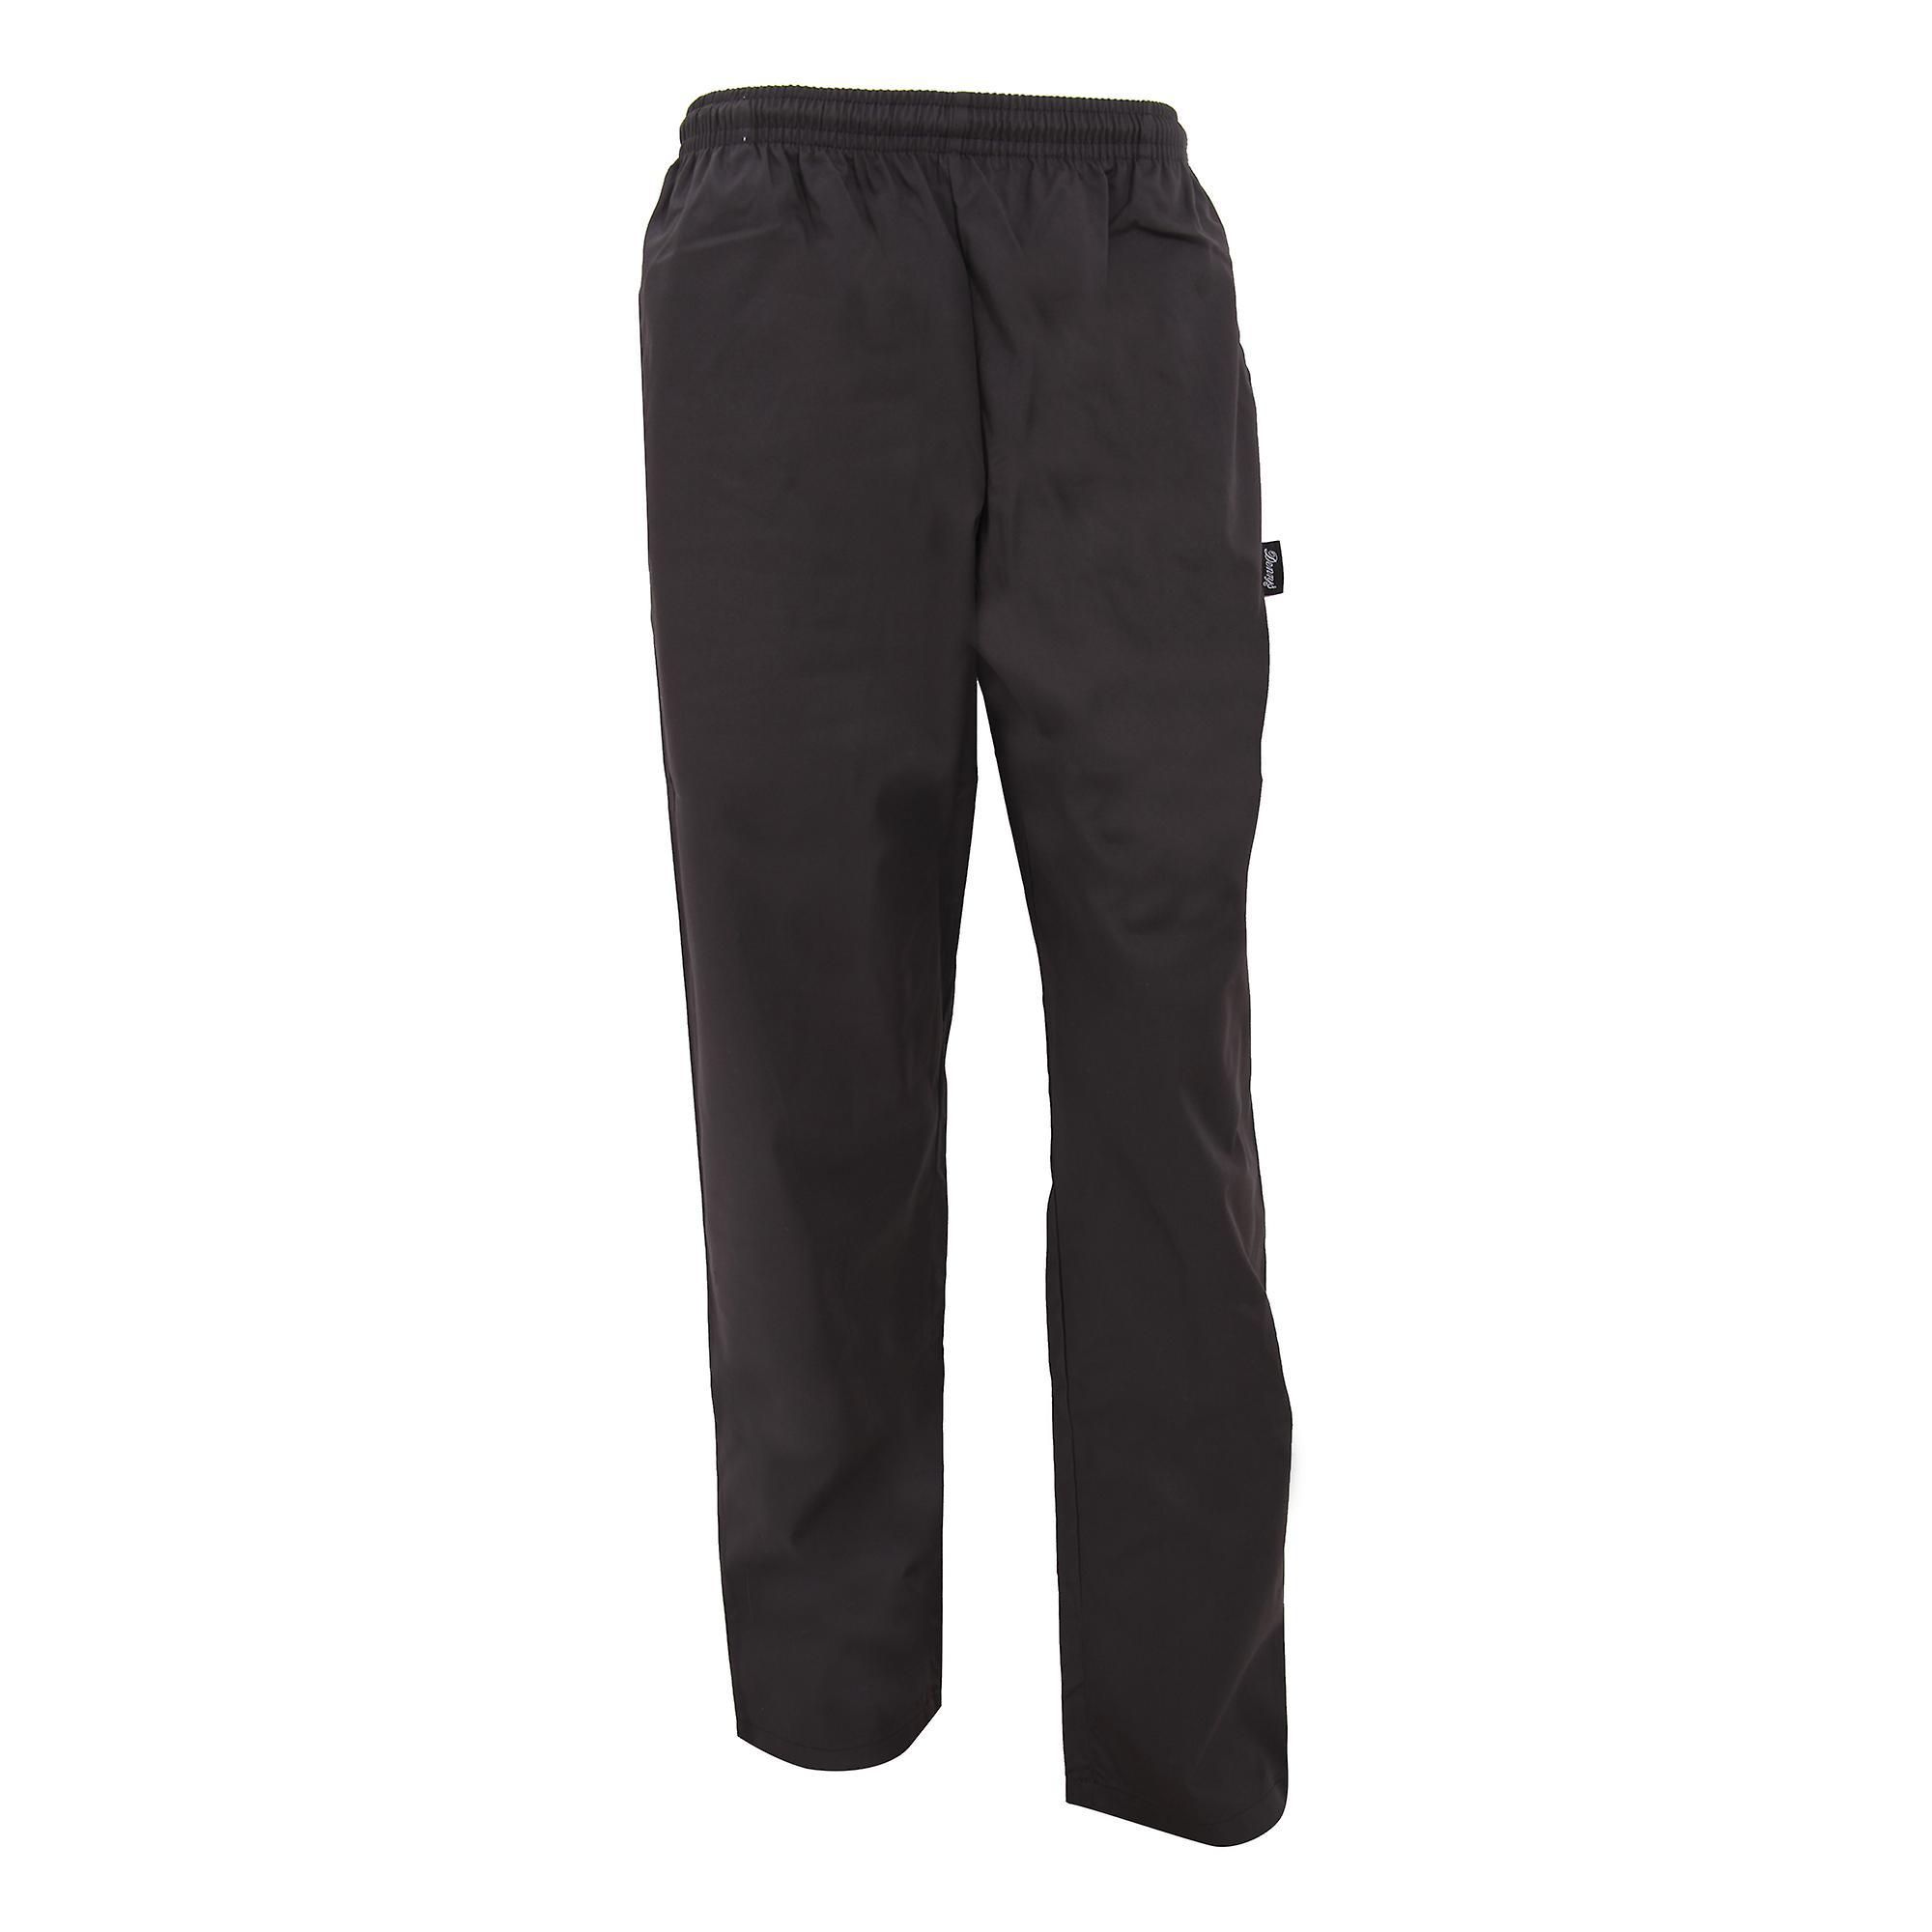 Dennys Unisex Black Elasticated Trouser / Chefswear